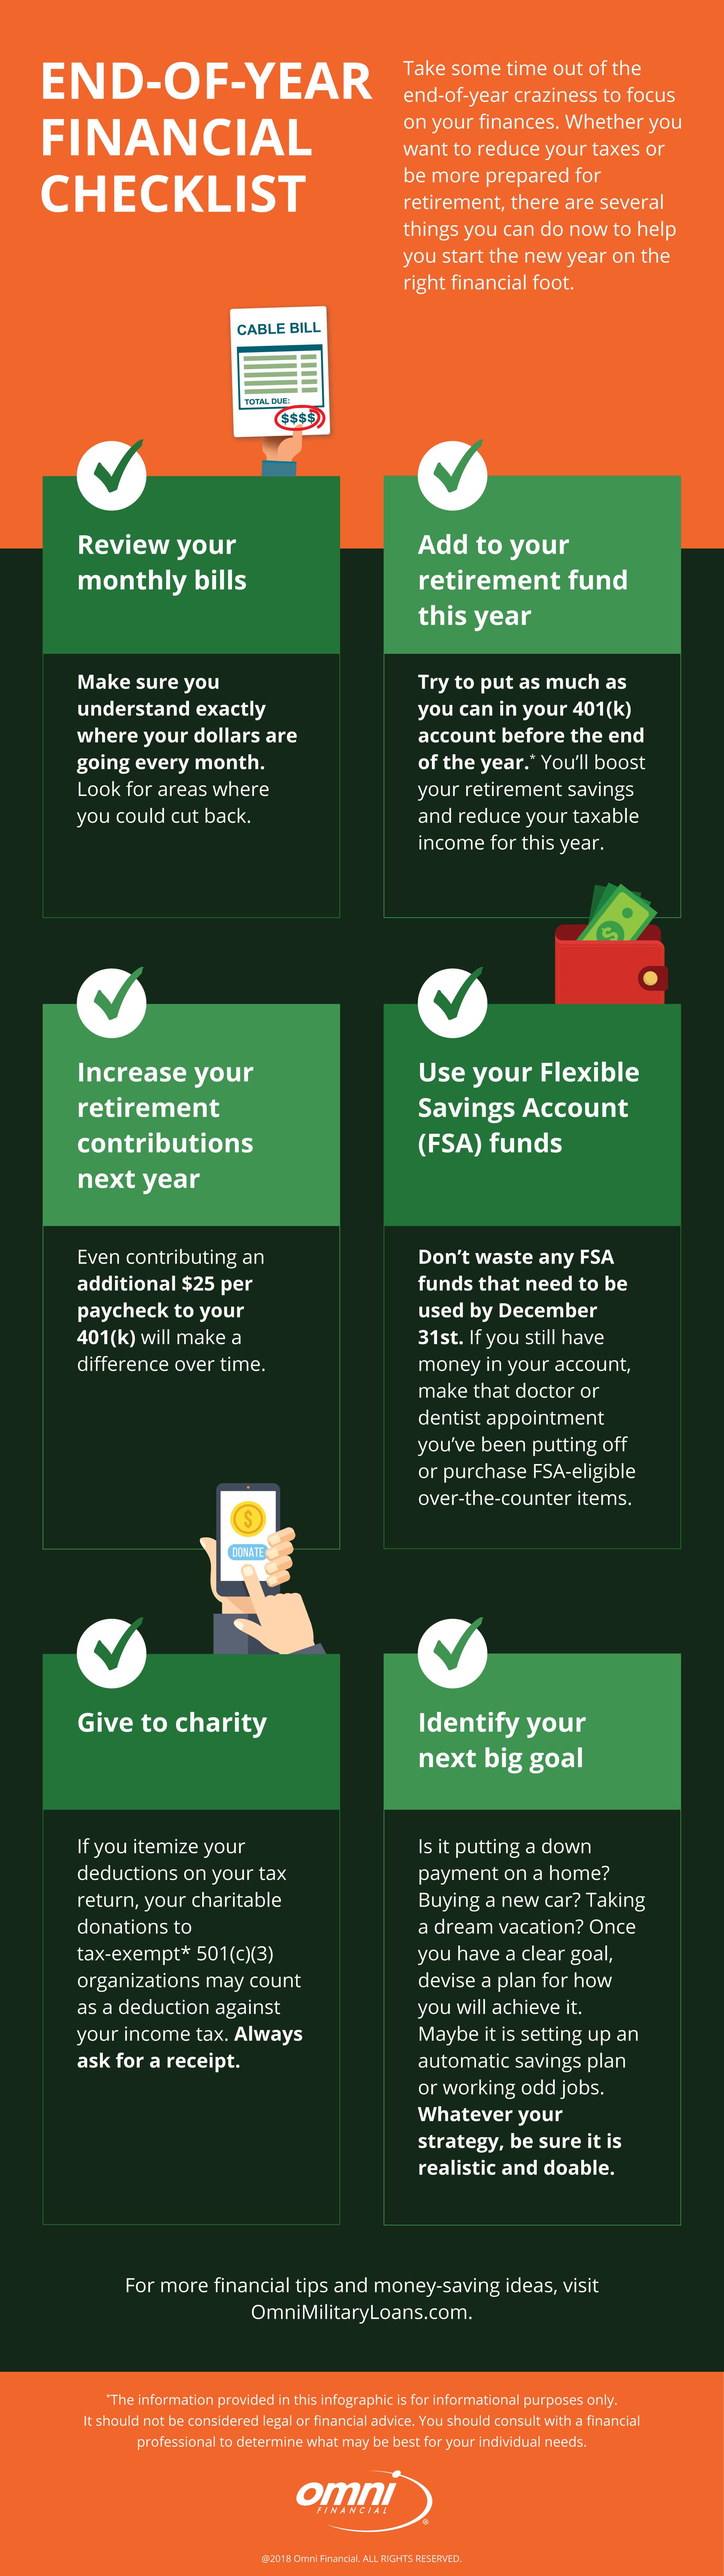 End-of-Year Financial Checklist